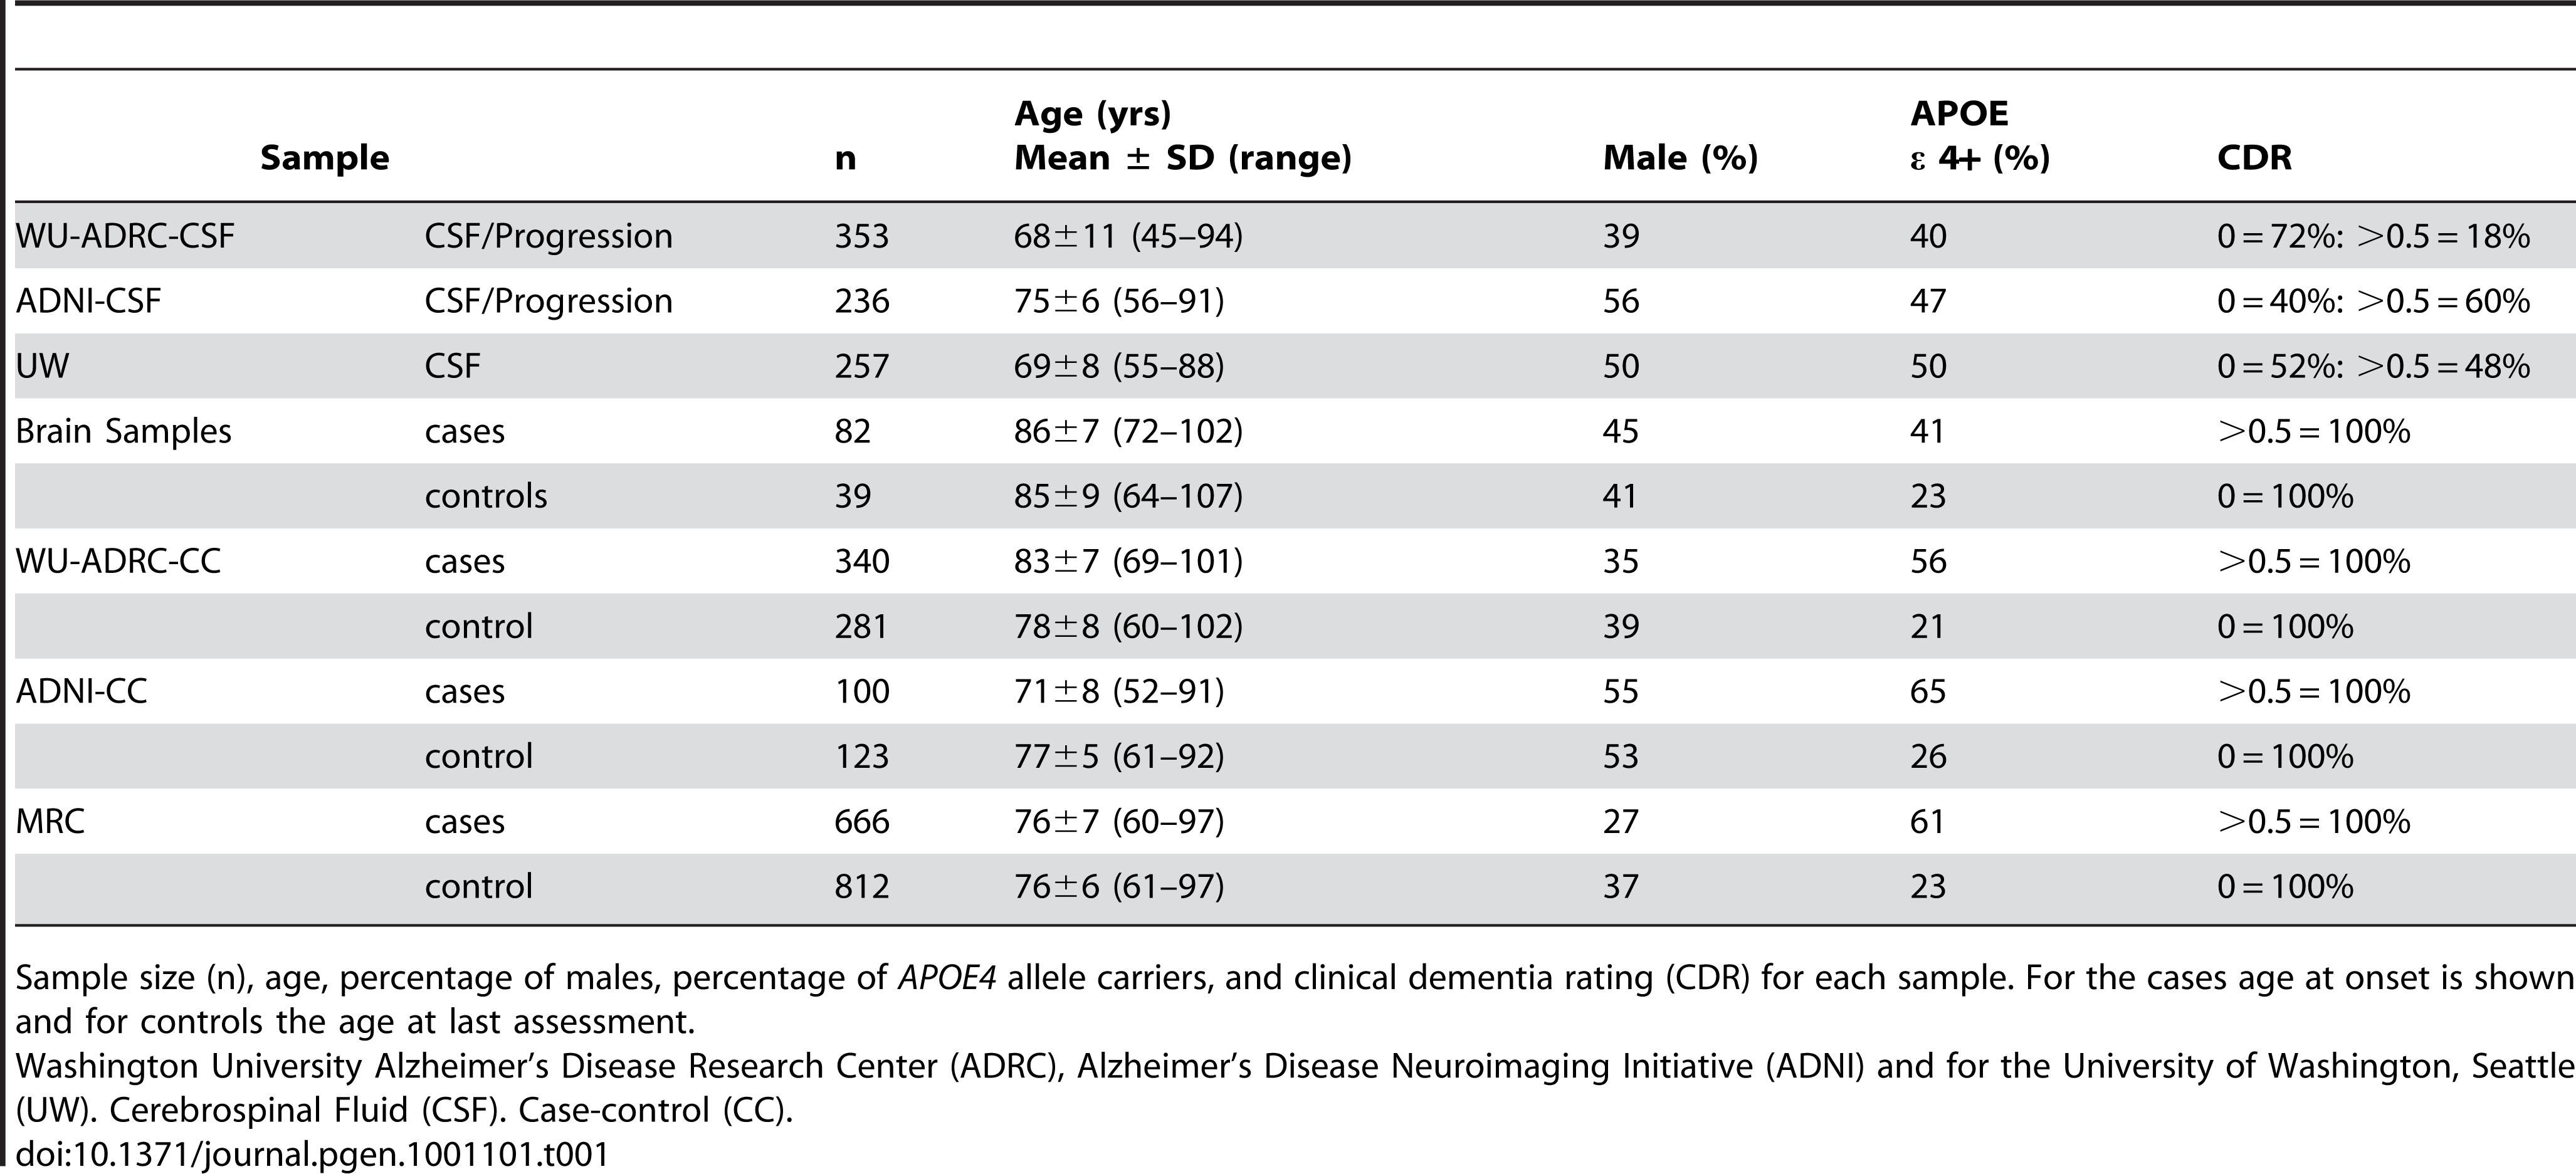 Summary of sample characteristics.